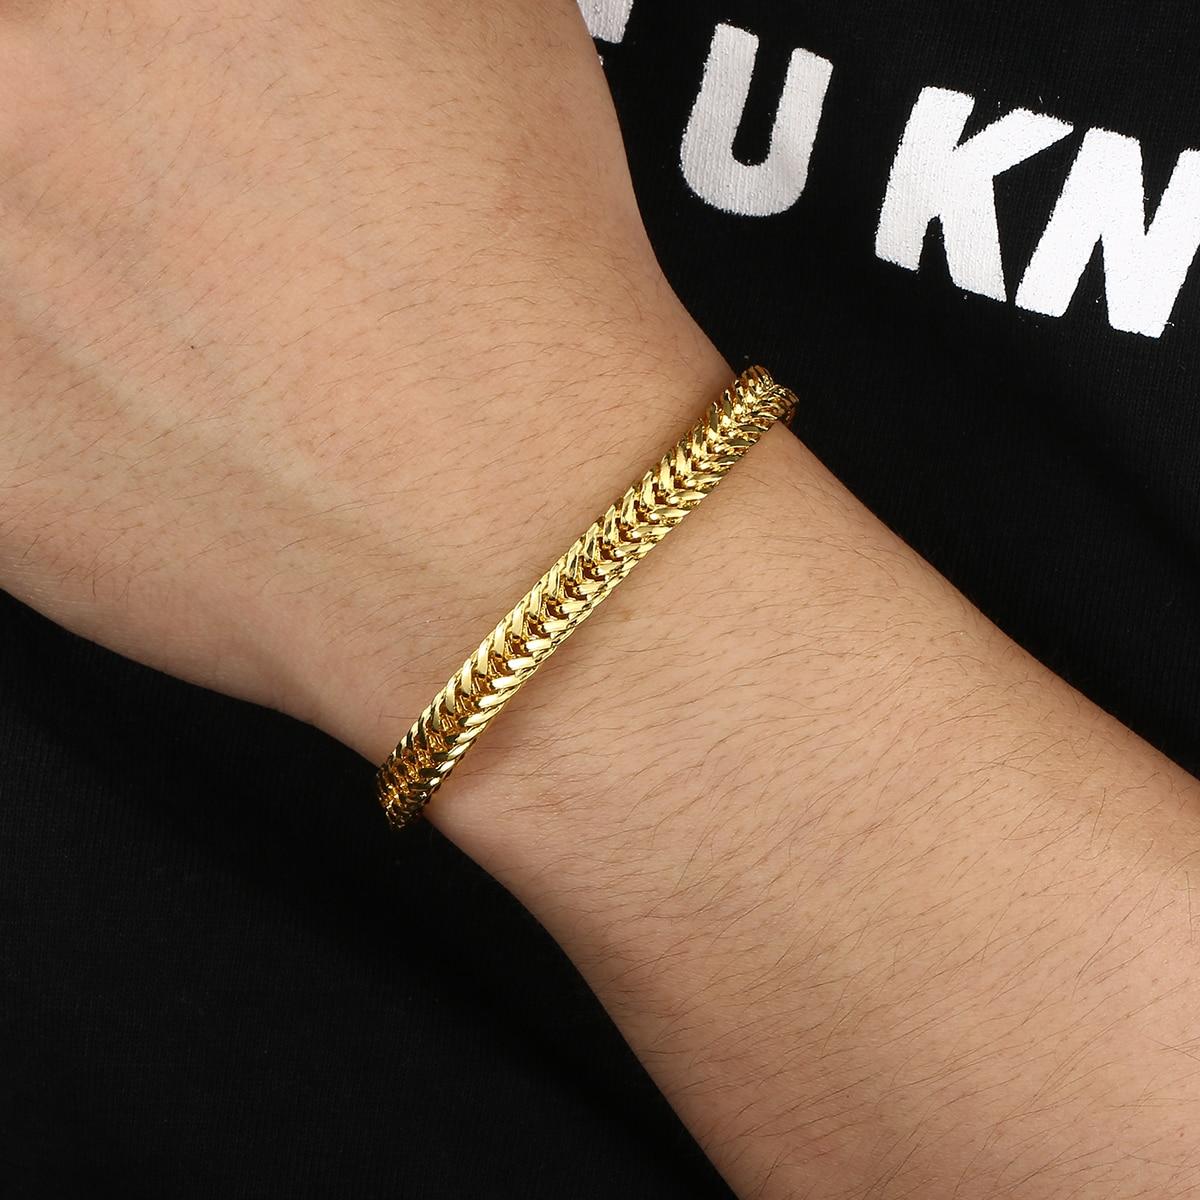 Vintage Snake Bracelet Men Gold Flat Snake Bone Wrist Chain Minimalist Hip Hop Male Female Gold Bracelet Bangle pulseira homme